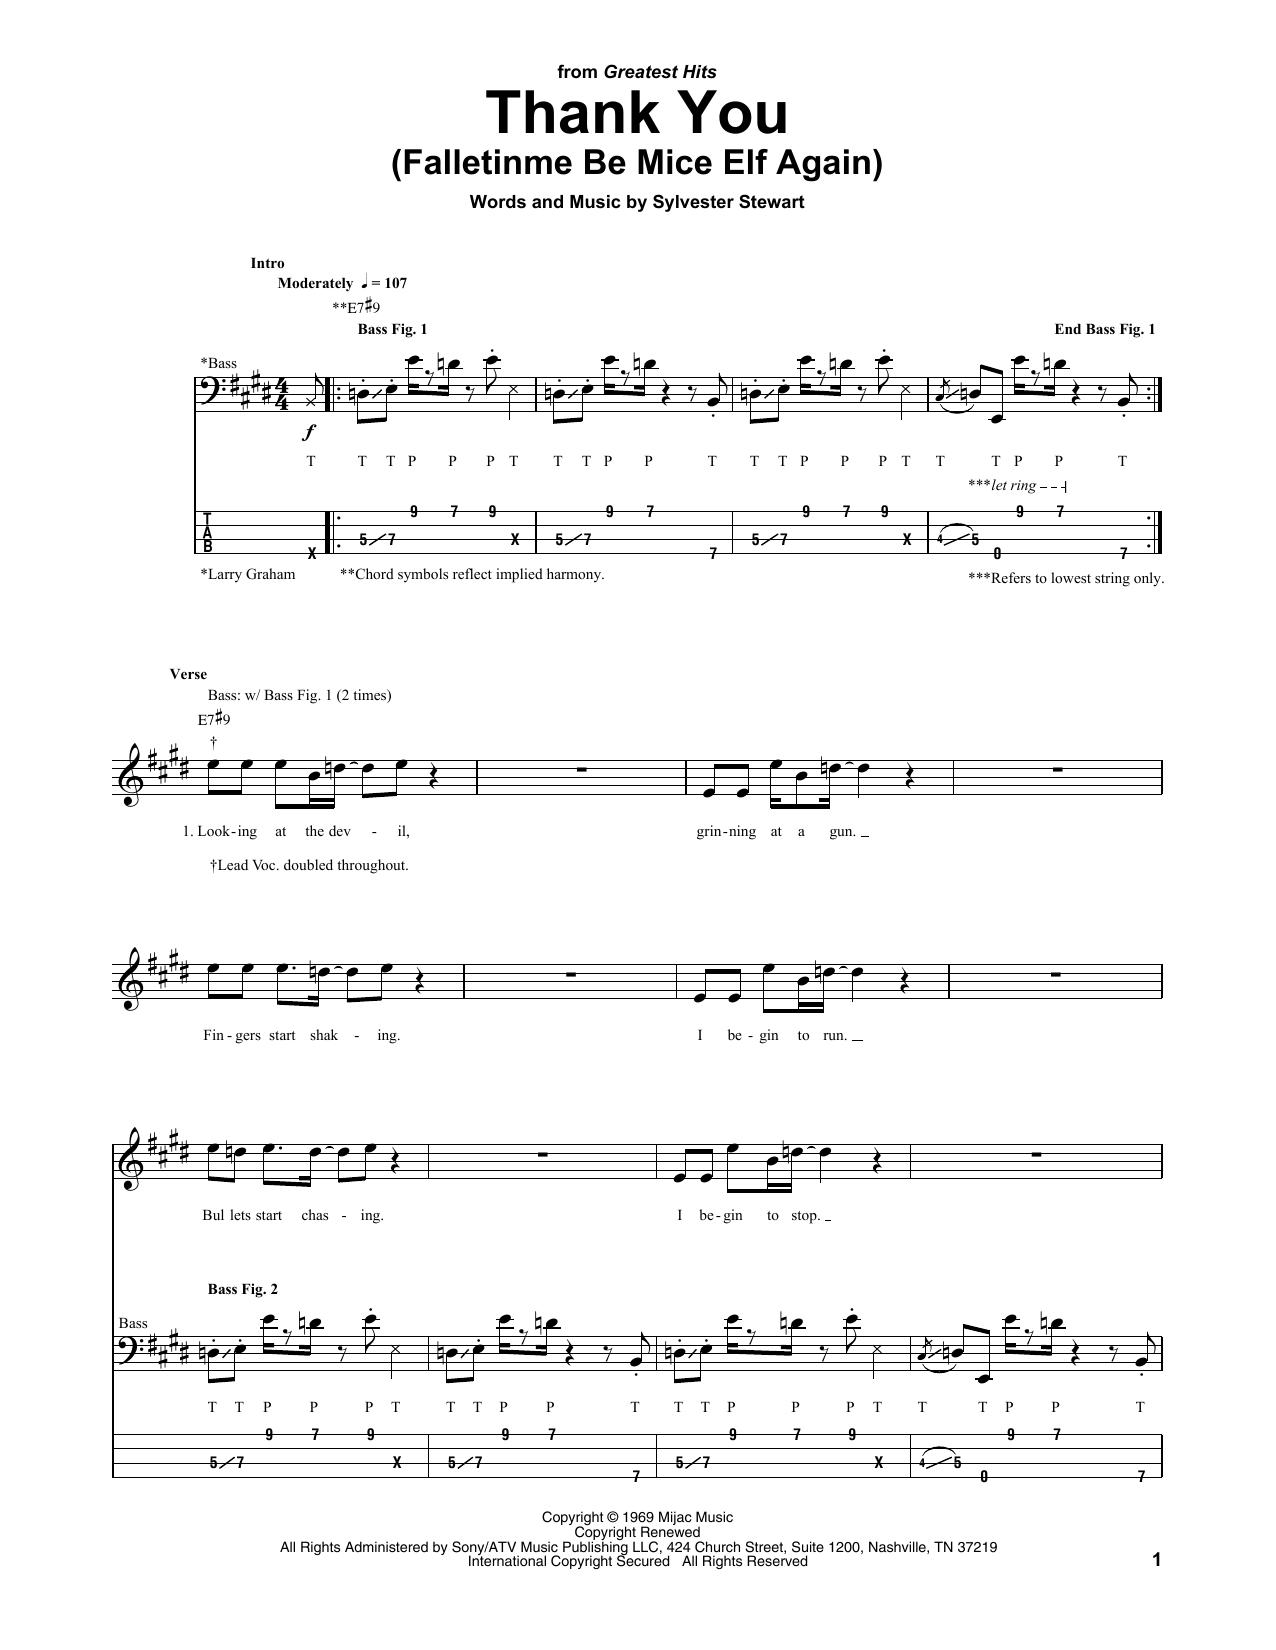 Thank You (Falletinme Be Mice Elf Again) Sheet Music